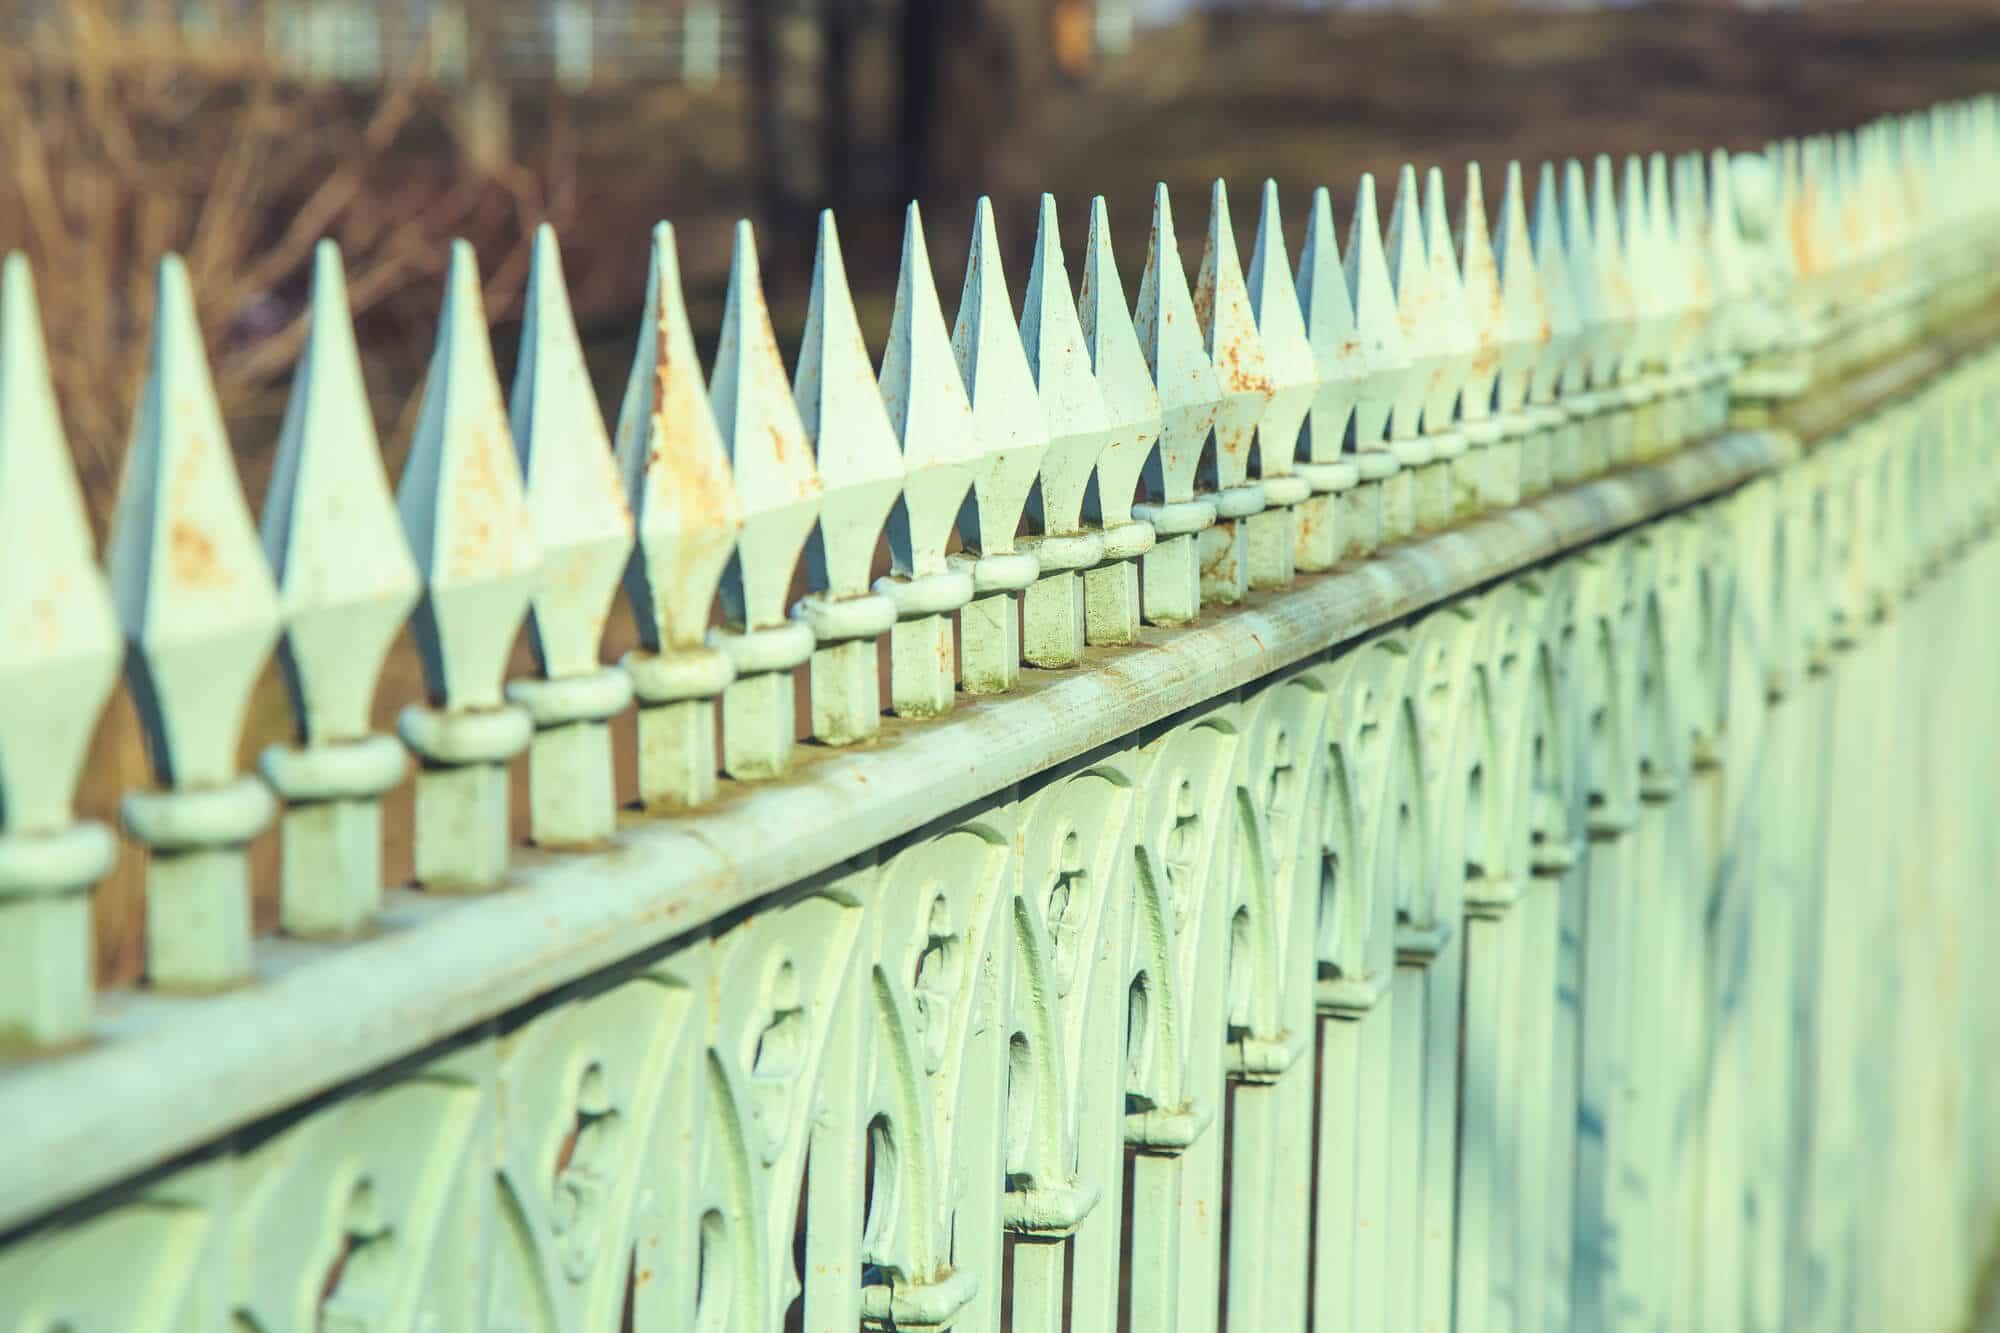 Rusted Picket Fences - Big Easy Fences